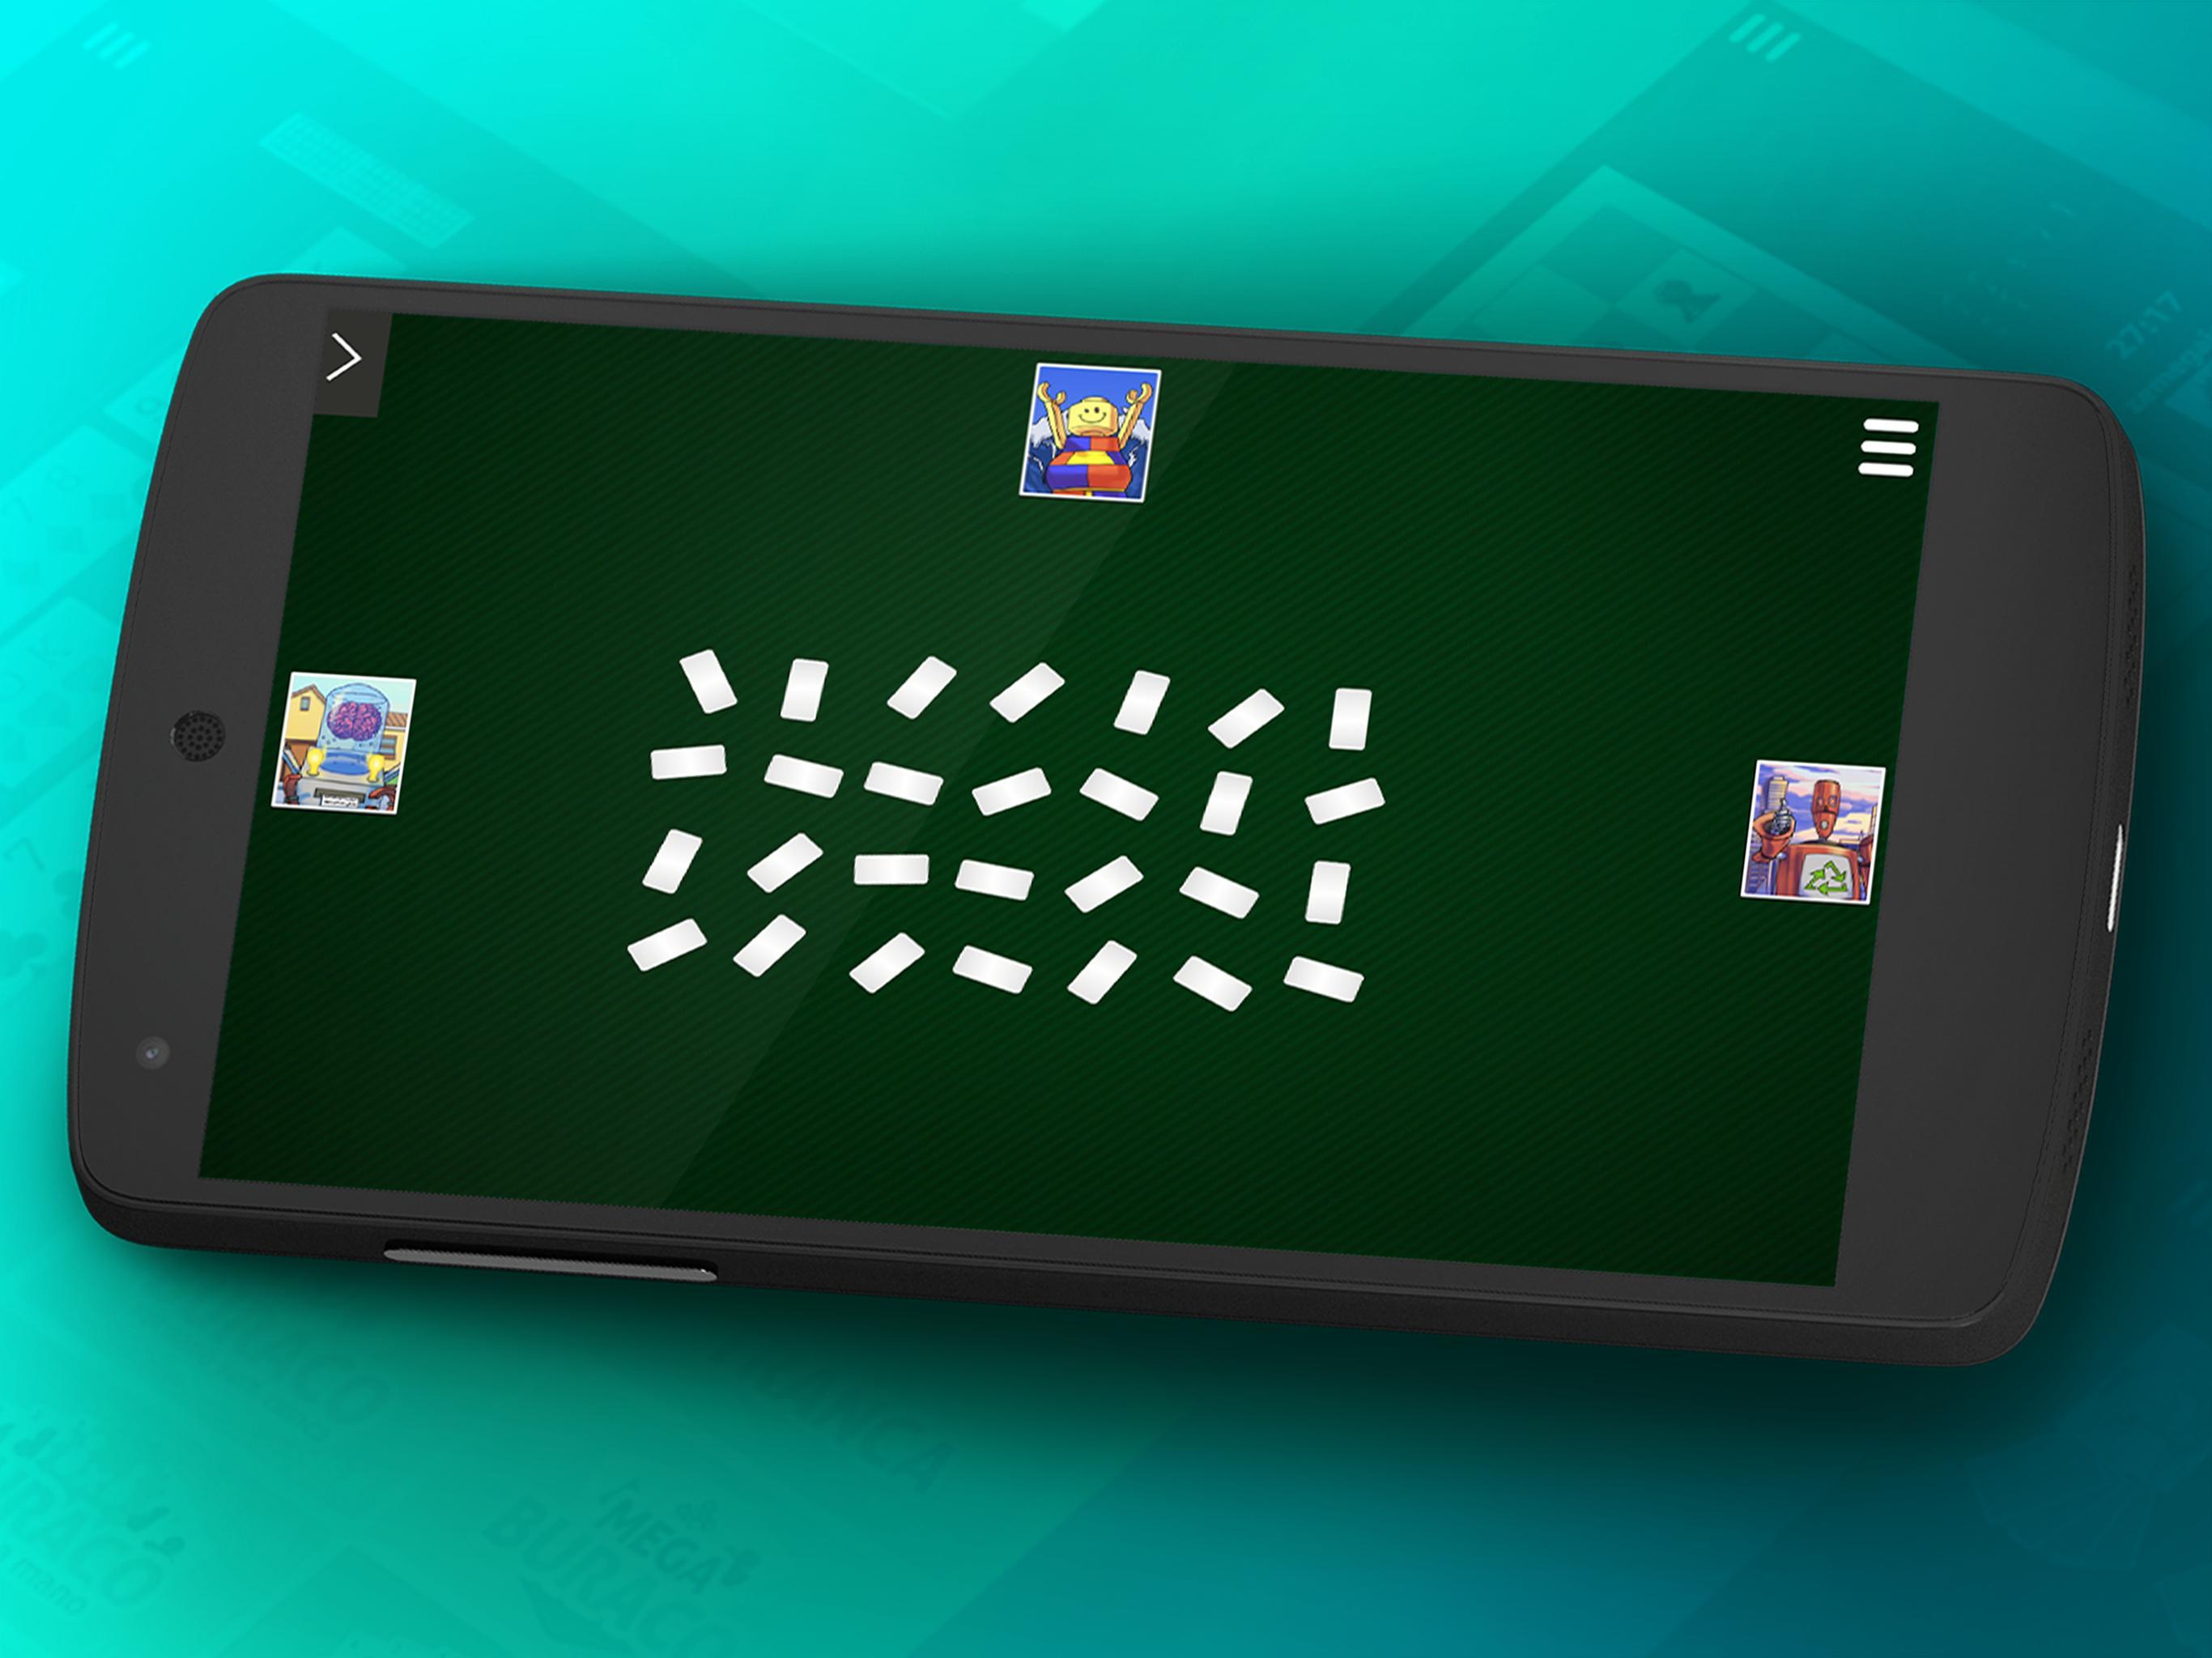 Dominoes Online - Free game 101.1.71 Screenshot 2